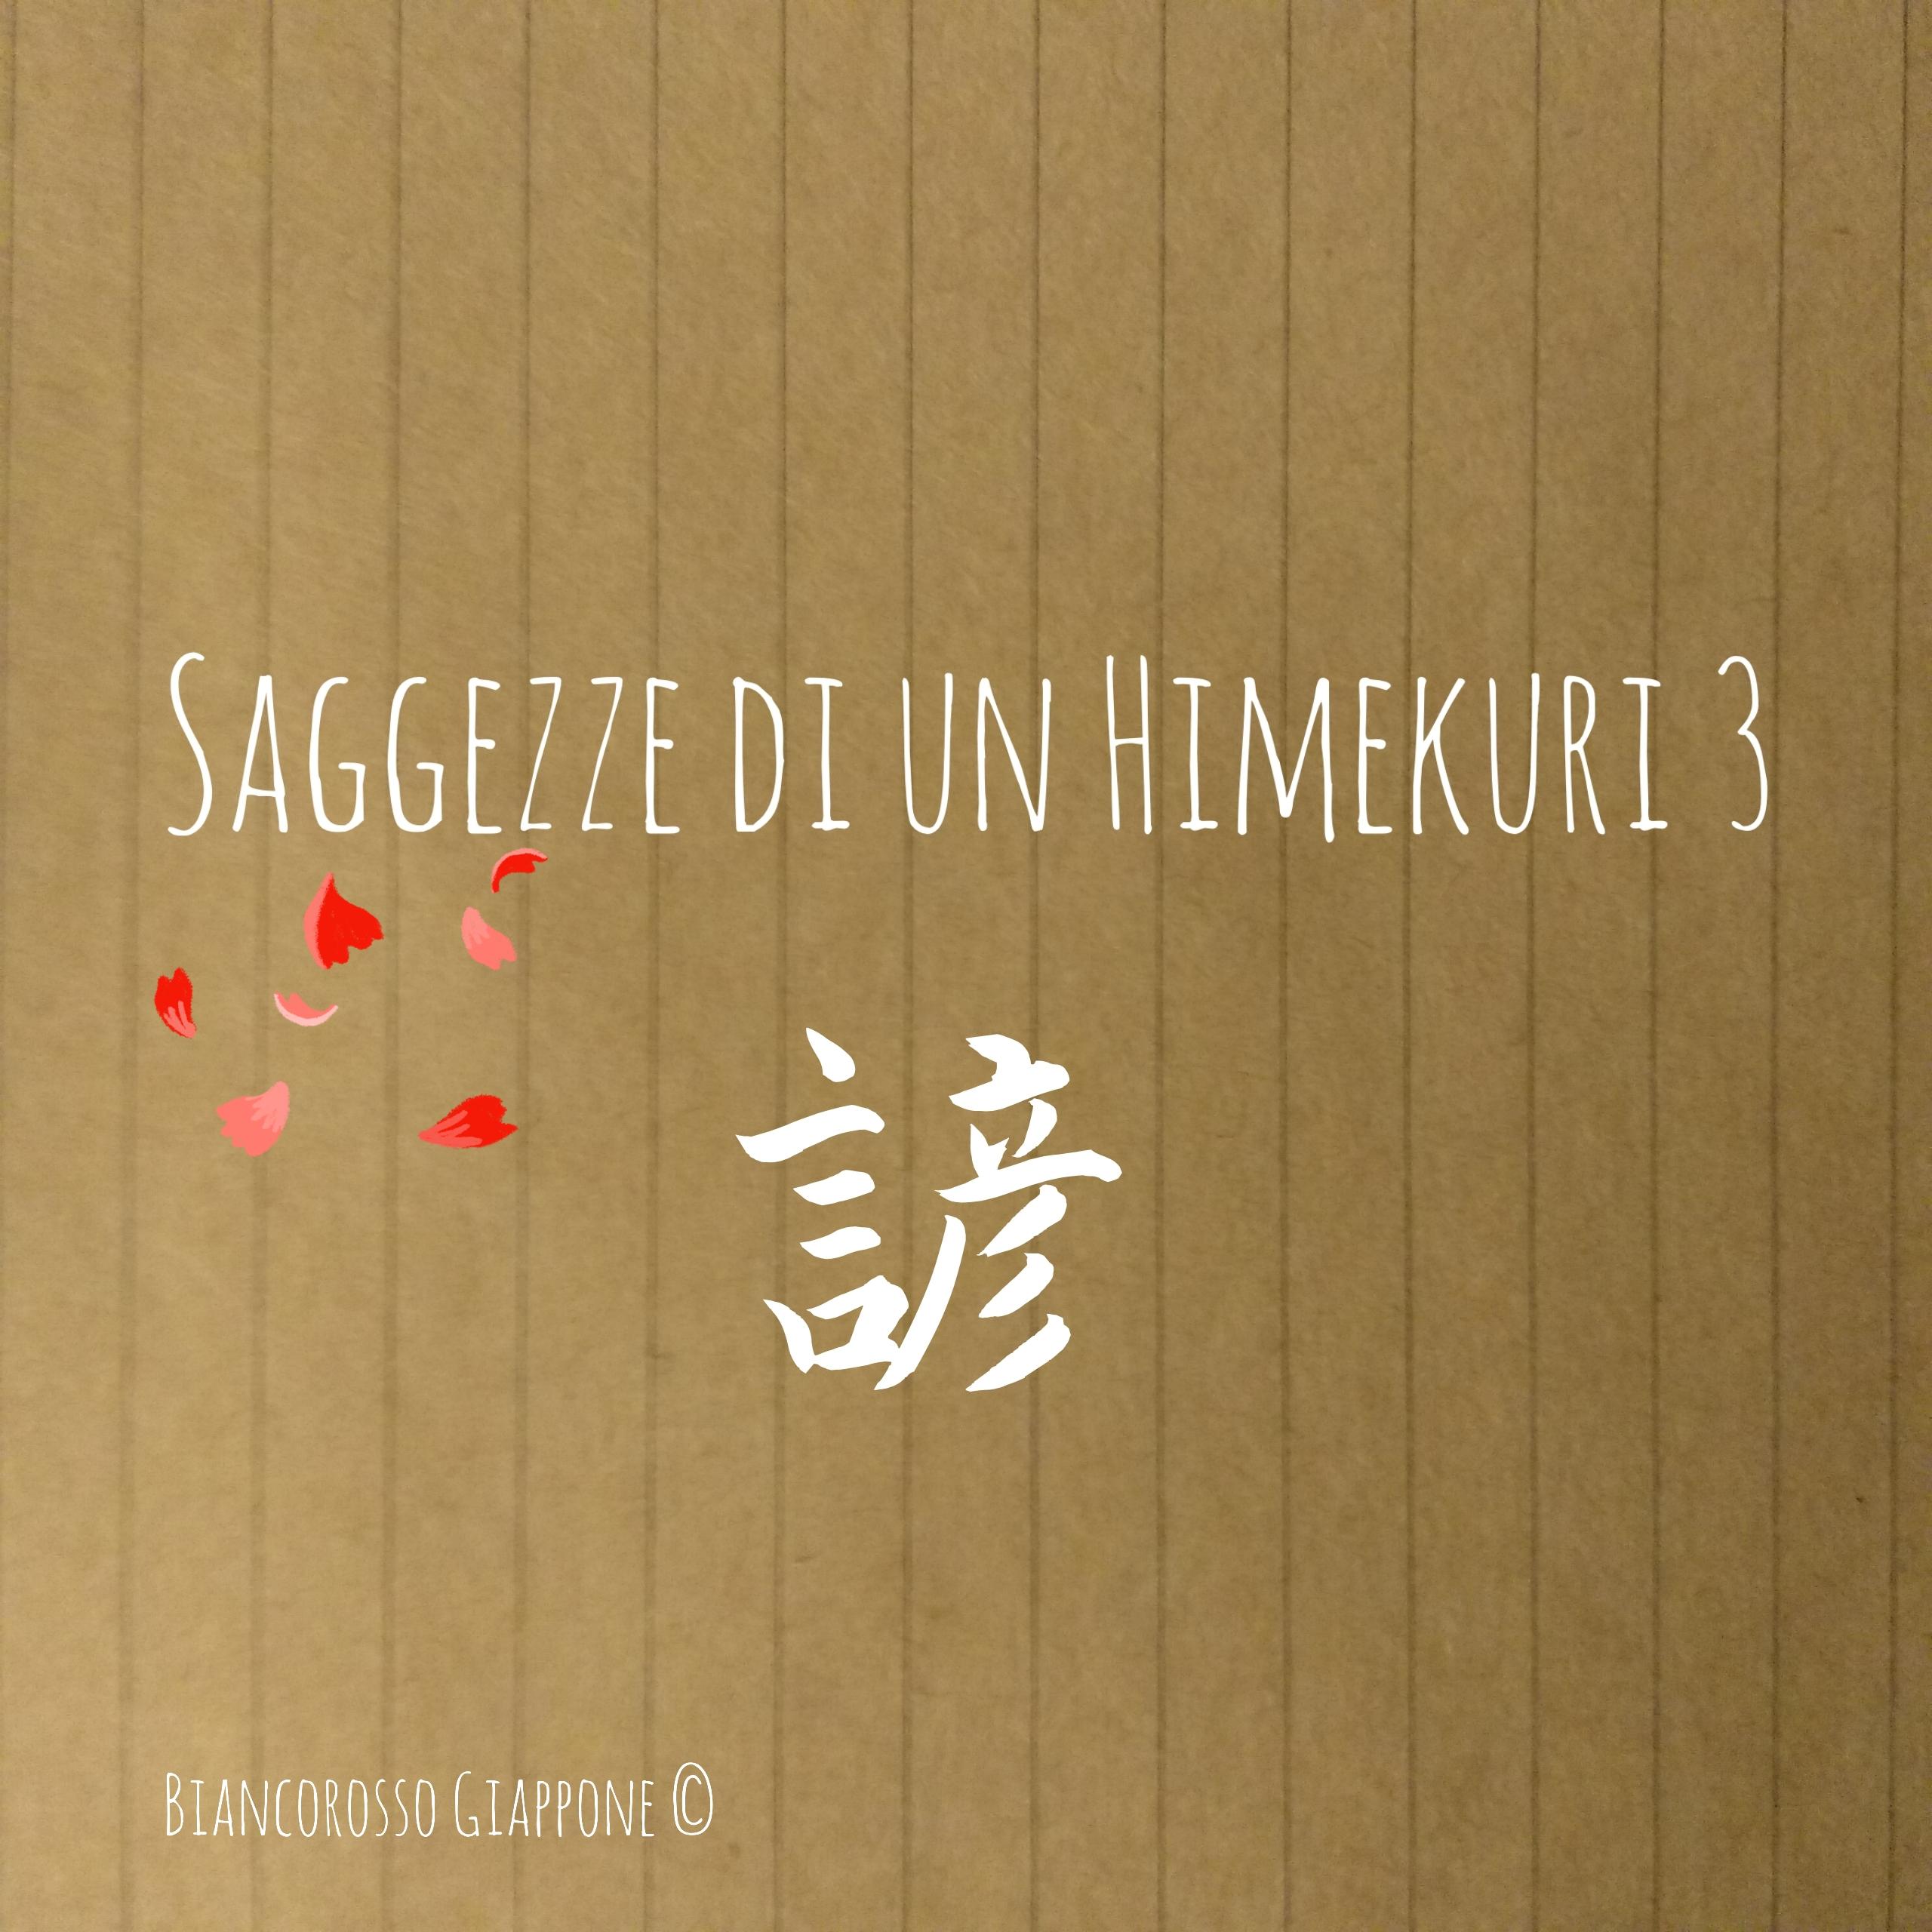 Himekuri 3